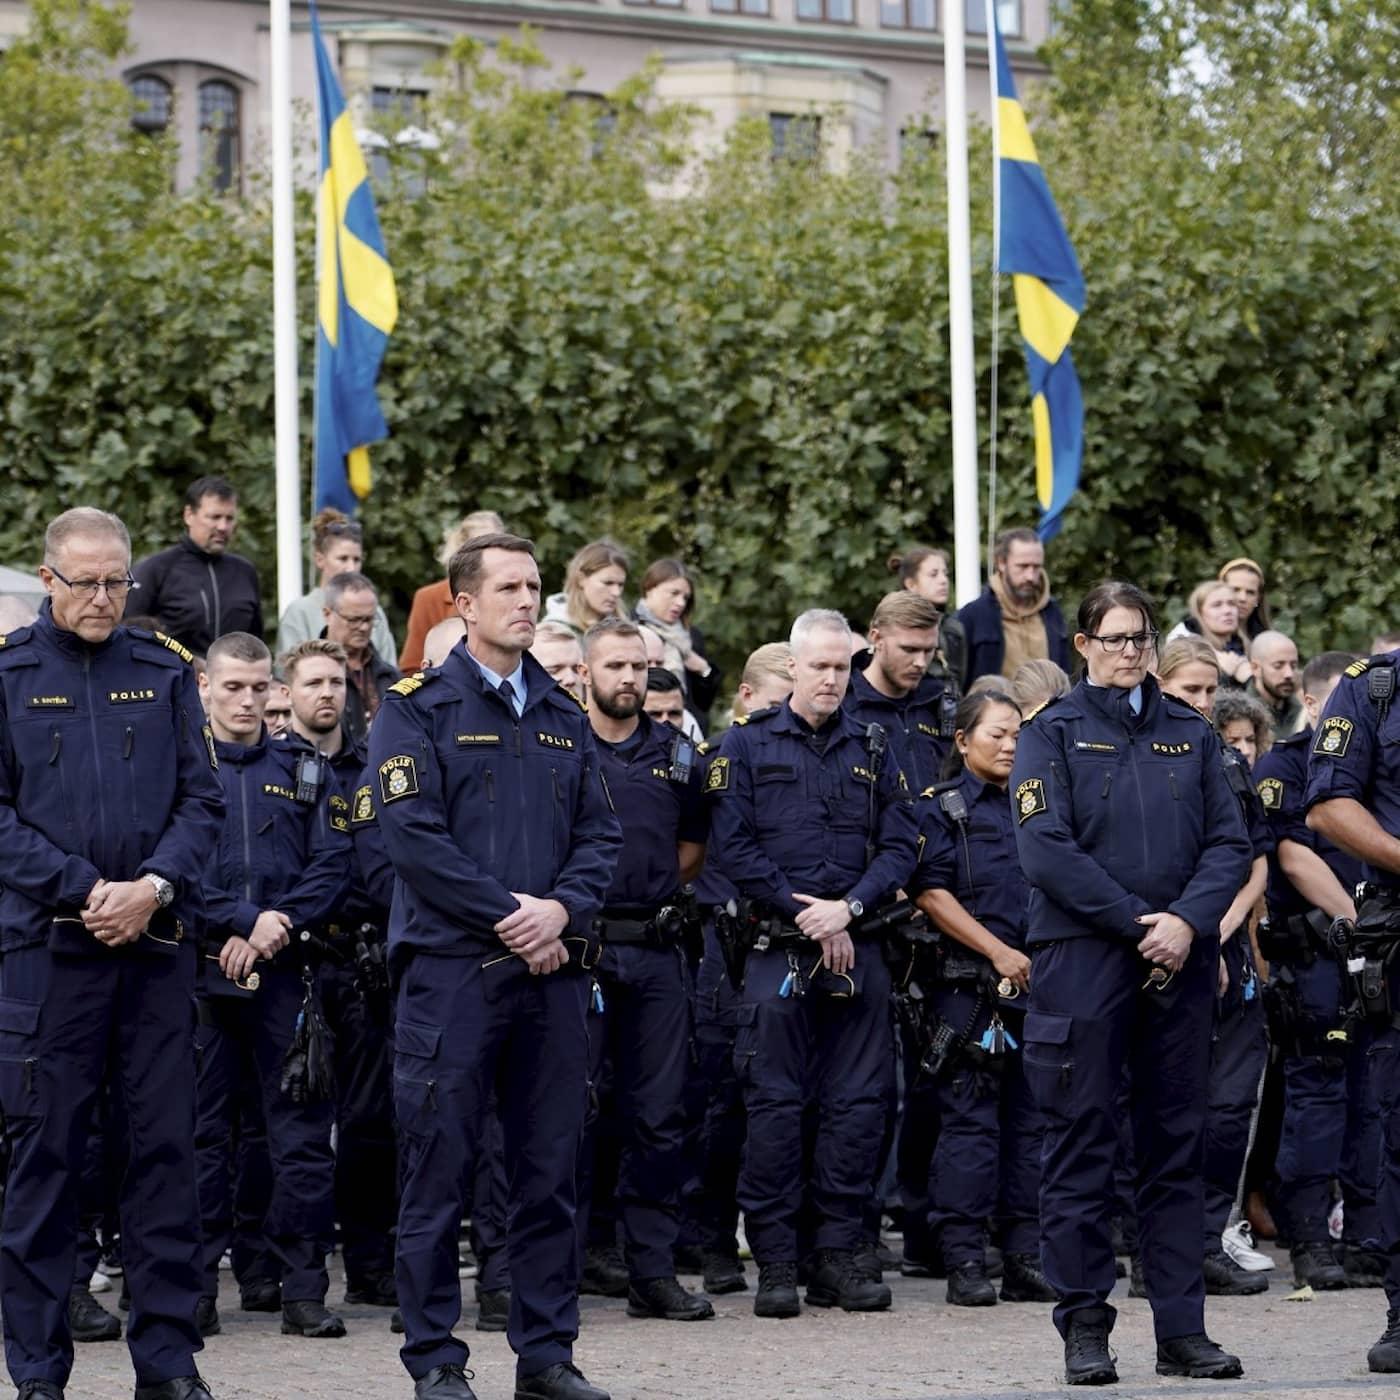 Artist Lars Vilks dies, Nobel Prize for Medicine announced, Volvo Cars on stock market, Gothenburg blast suspect wanted internationally